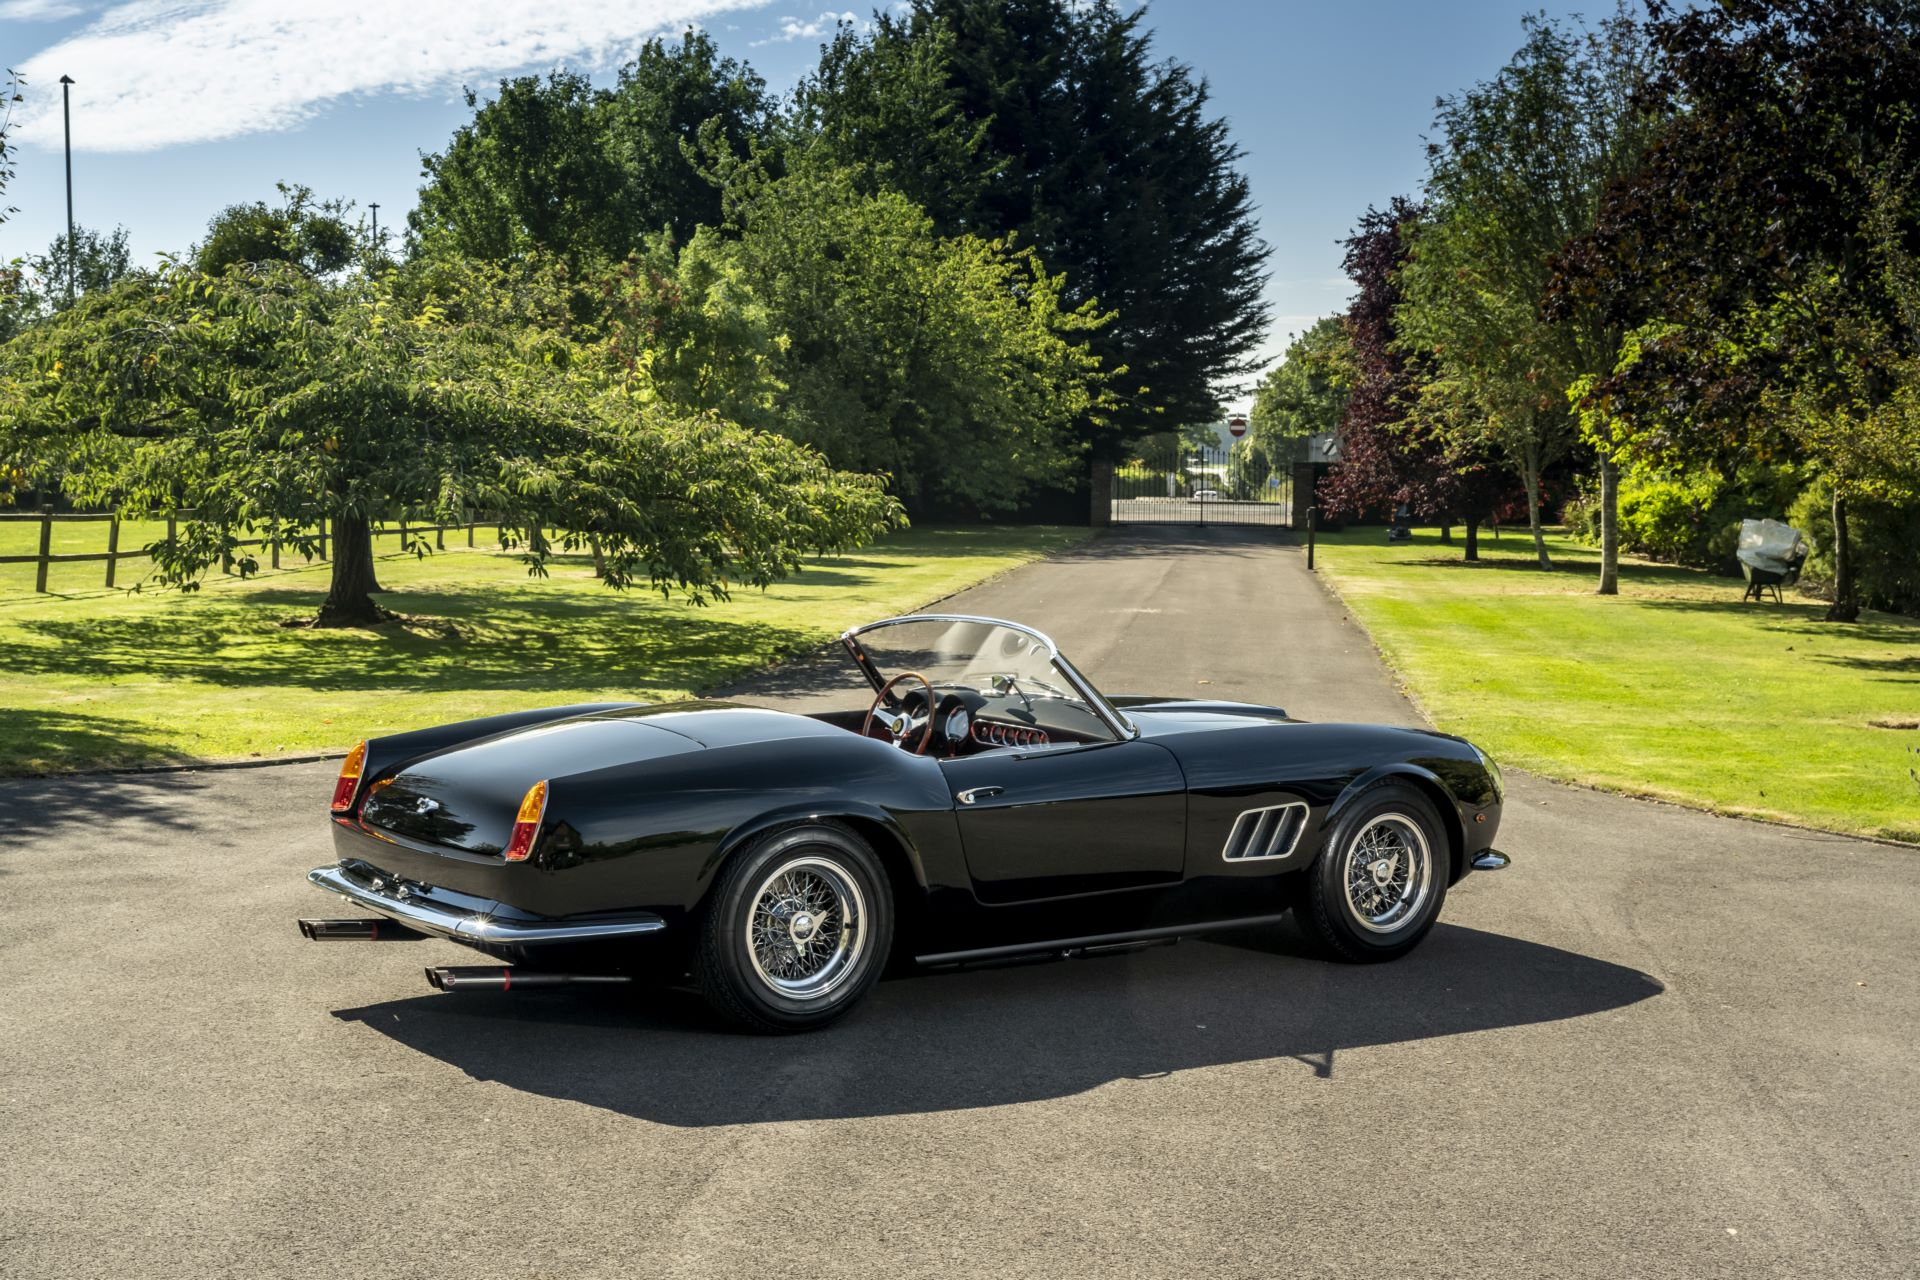 Ferrari-California-Spyder-by-GTO-Engineering-12